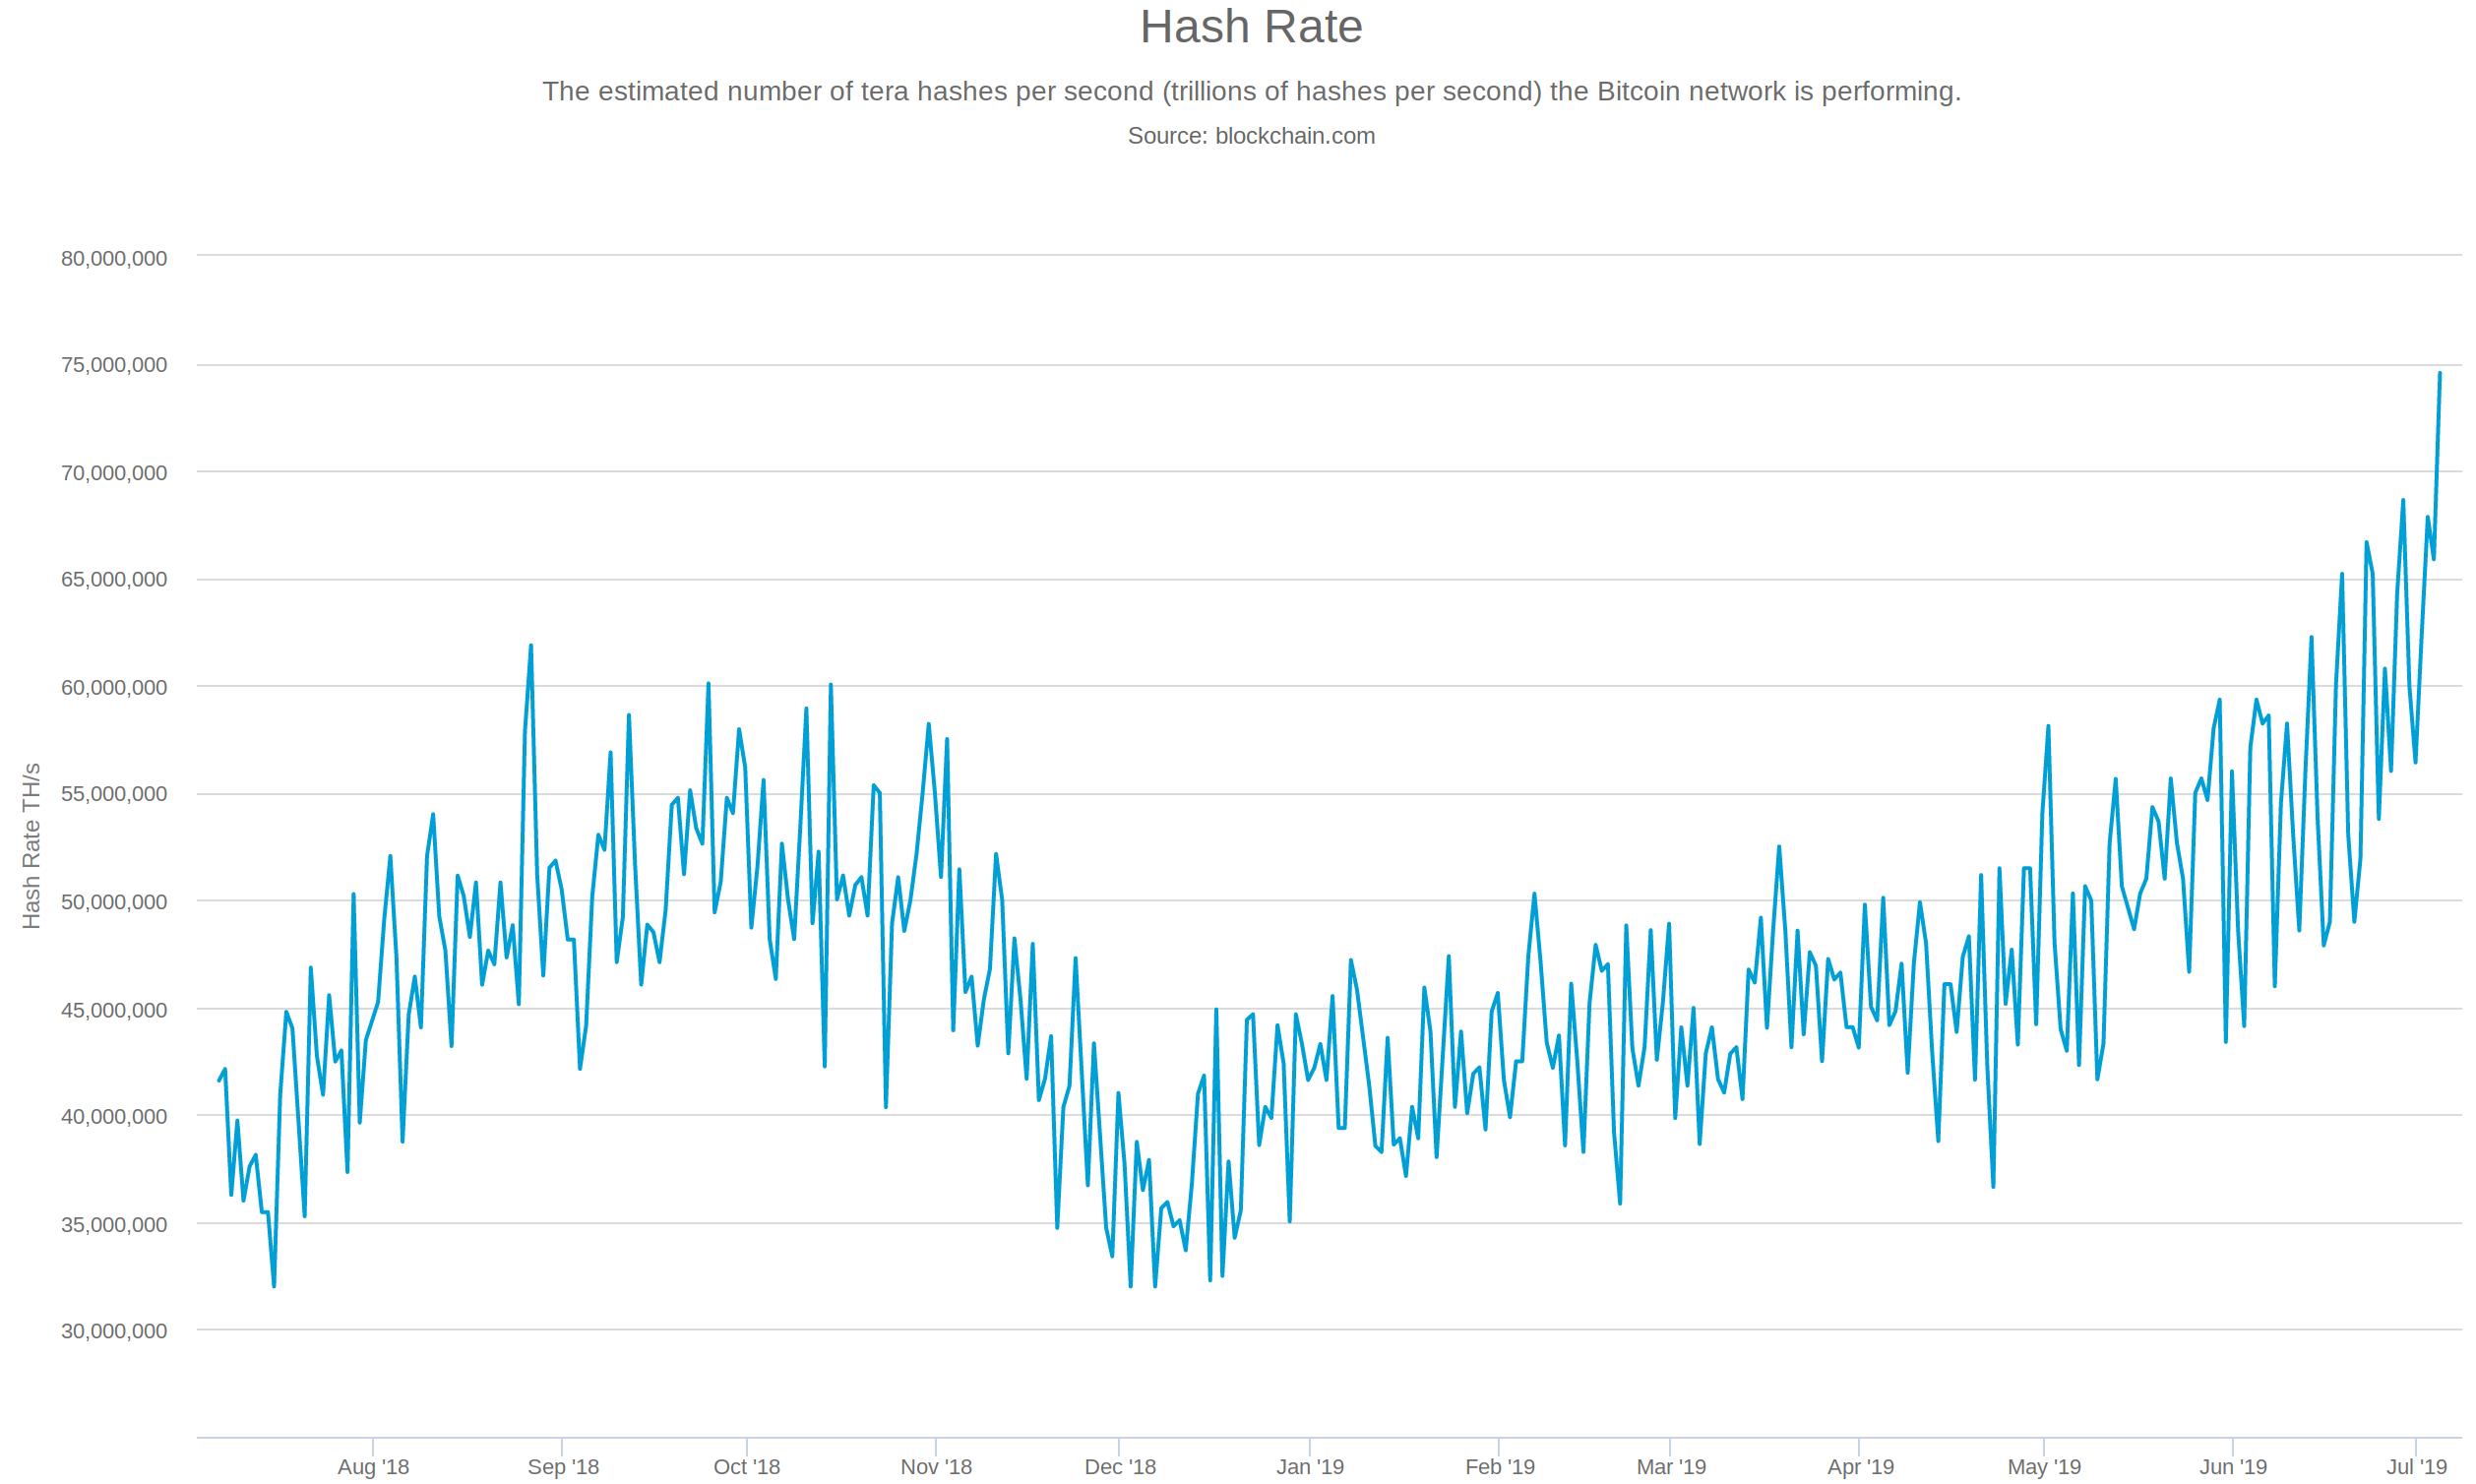 Хешрейт Биткойна взлетает до нового рекордно высокого уровня - плюс Ethereum, Ripple и XRP, Litecoin, Stellar, Tron